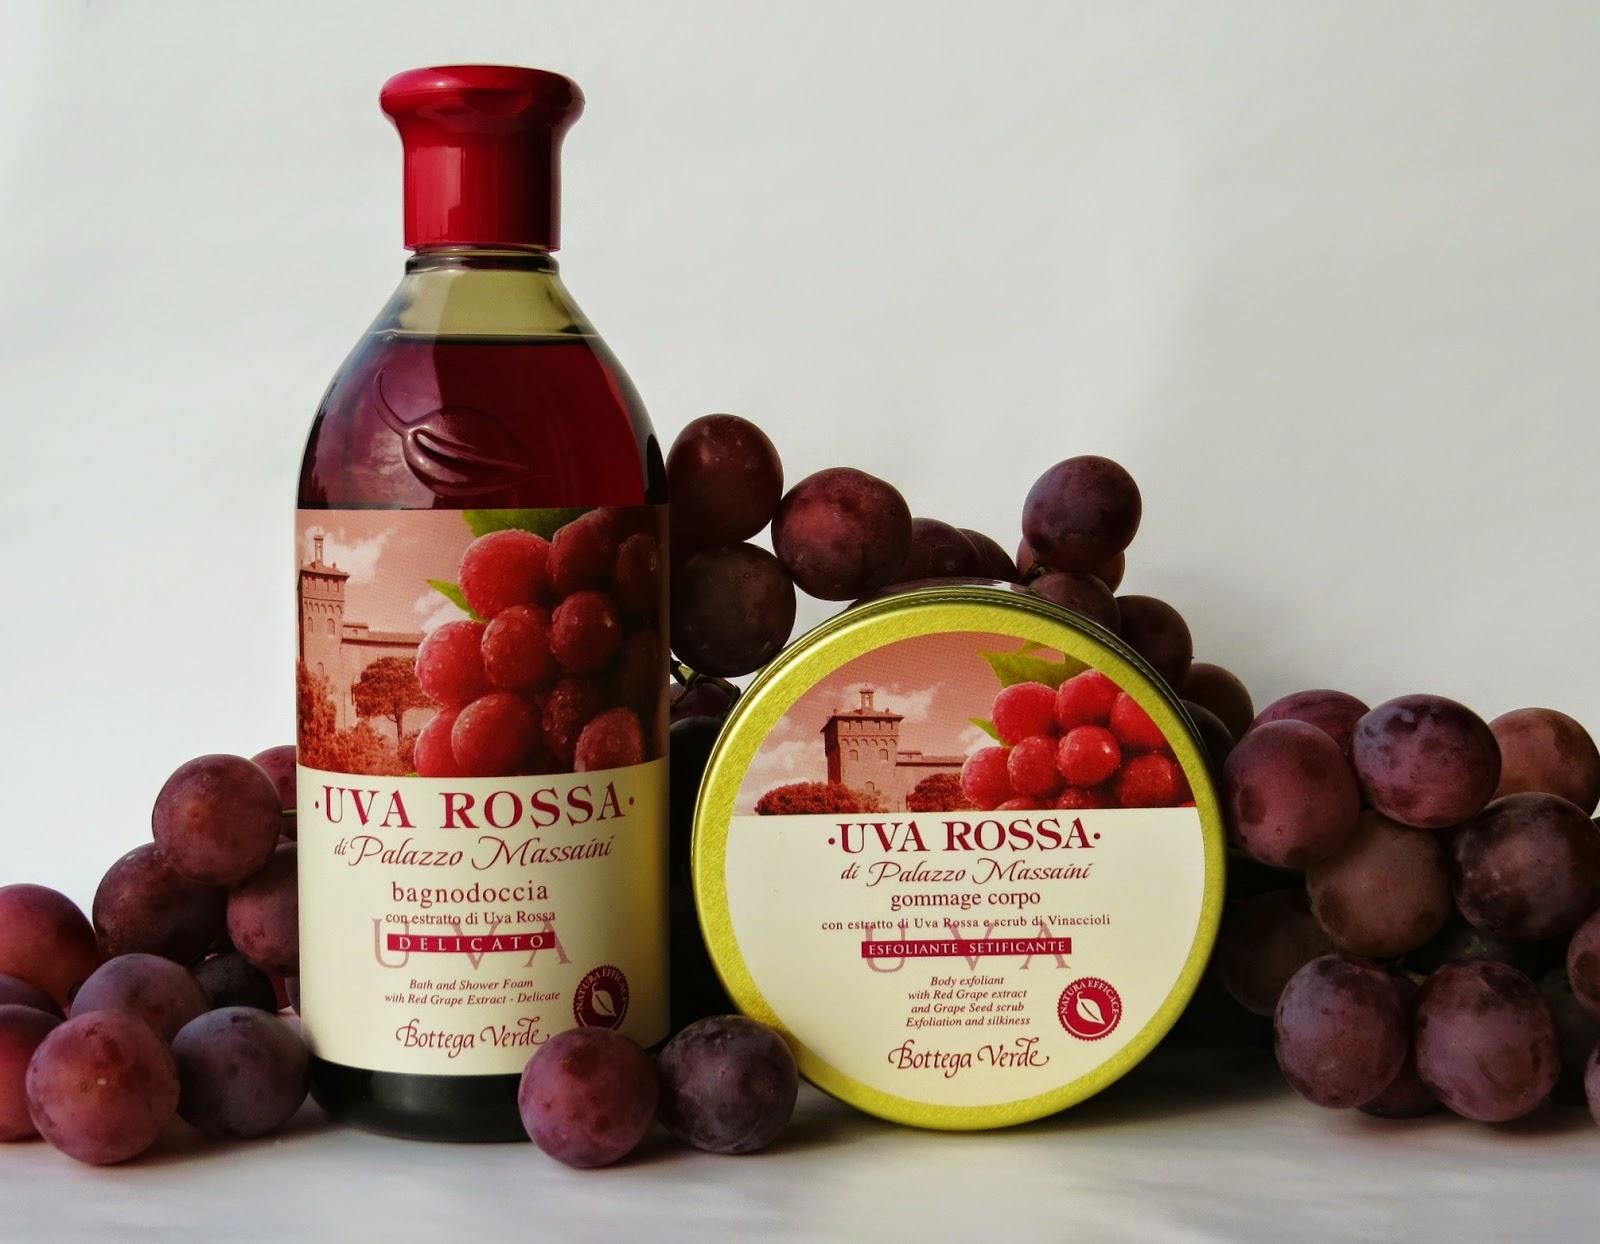 Bagno Doccia Bottega Verde : Belletto! make up and beauty blog: bottega verde uva rossa di